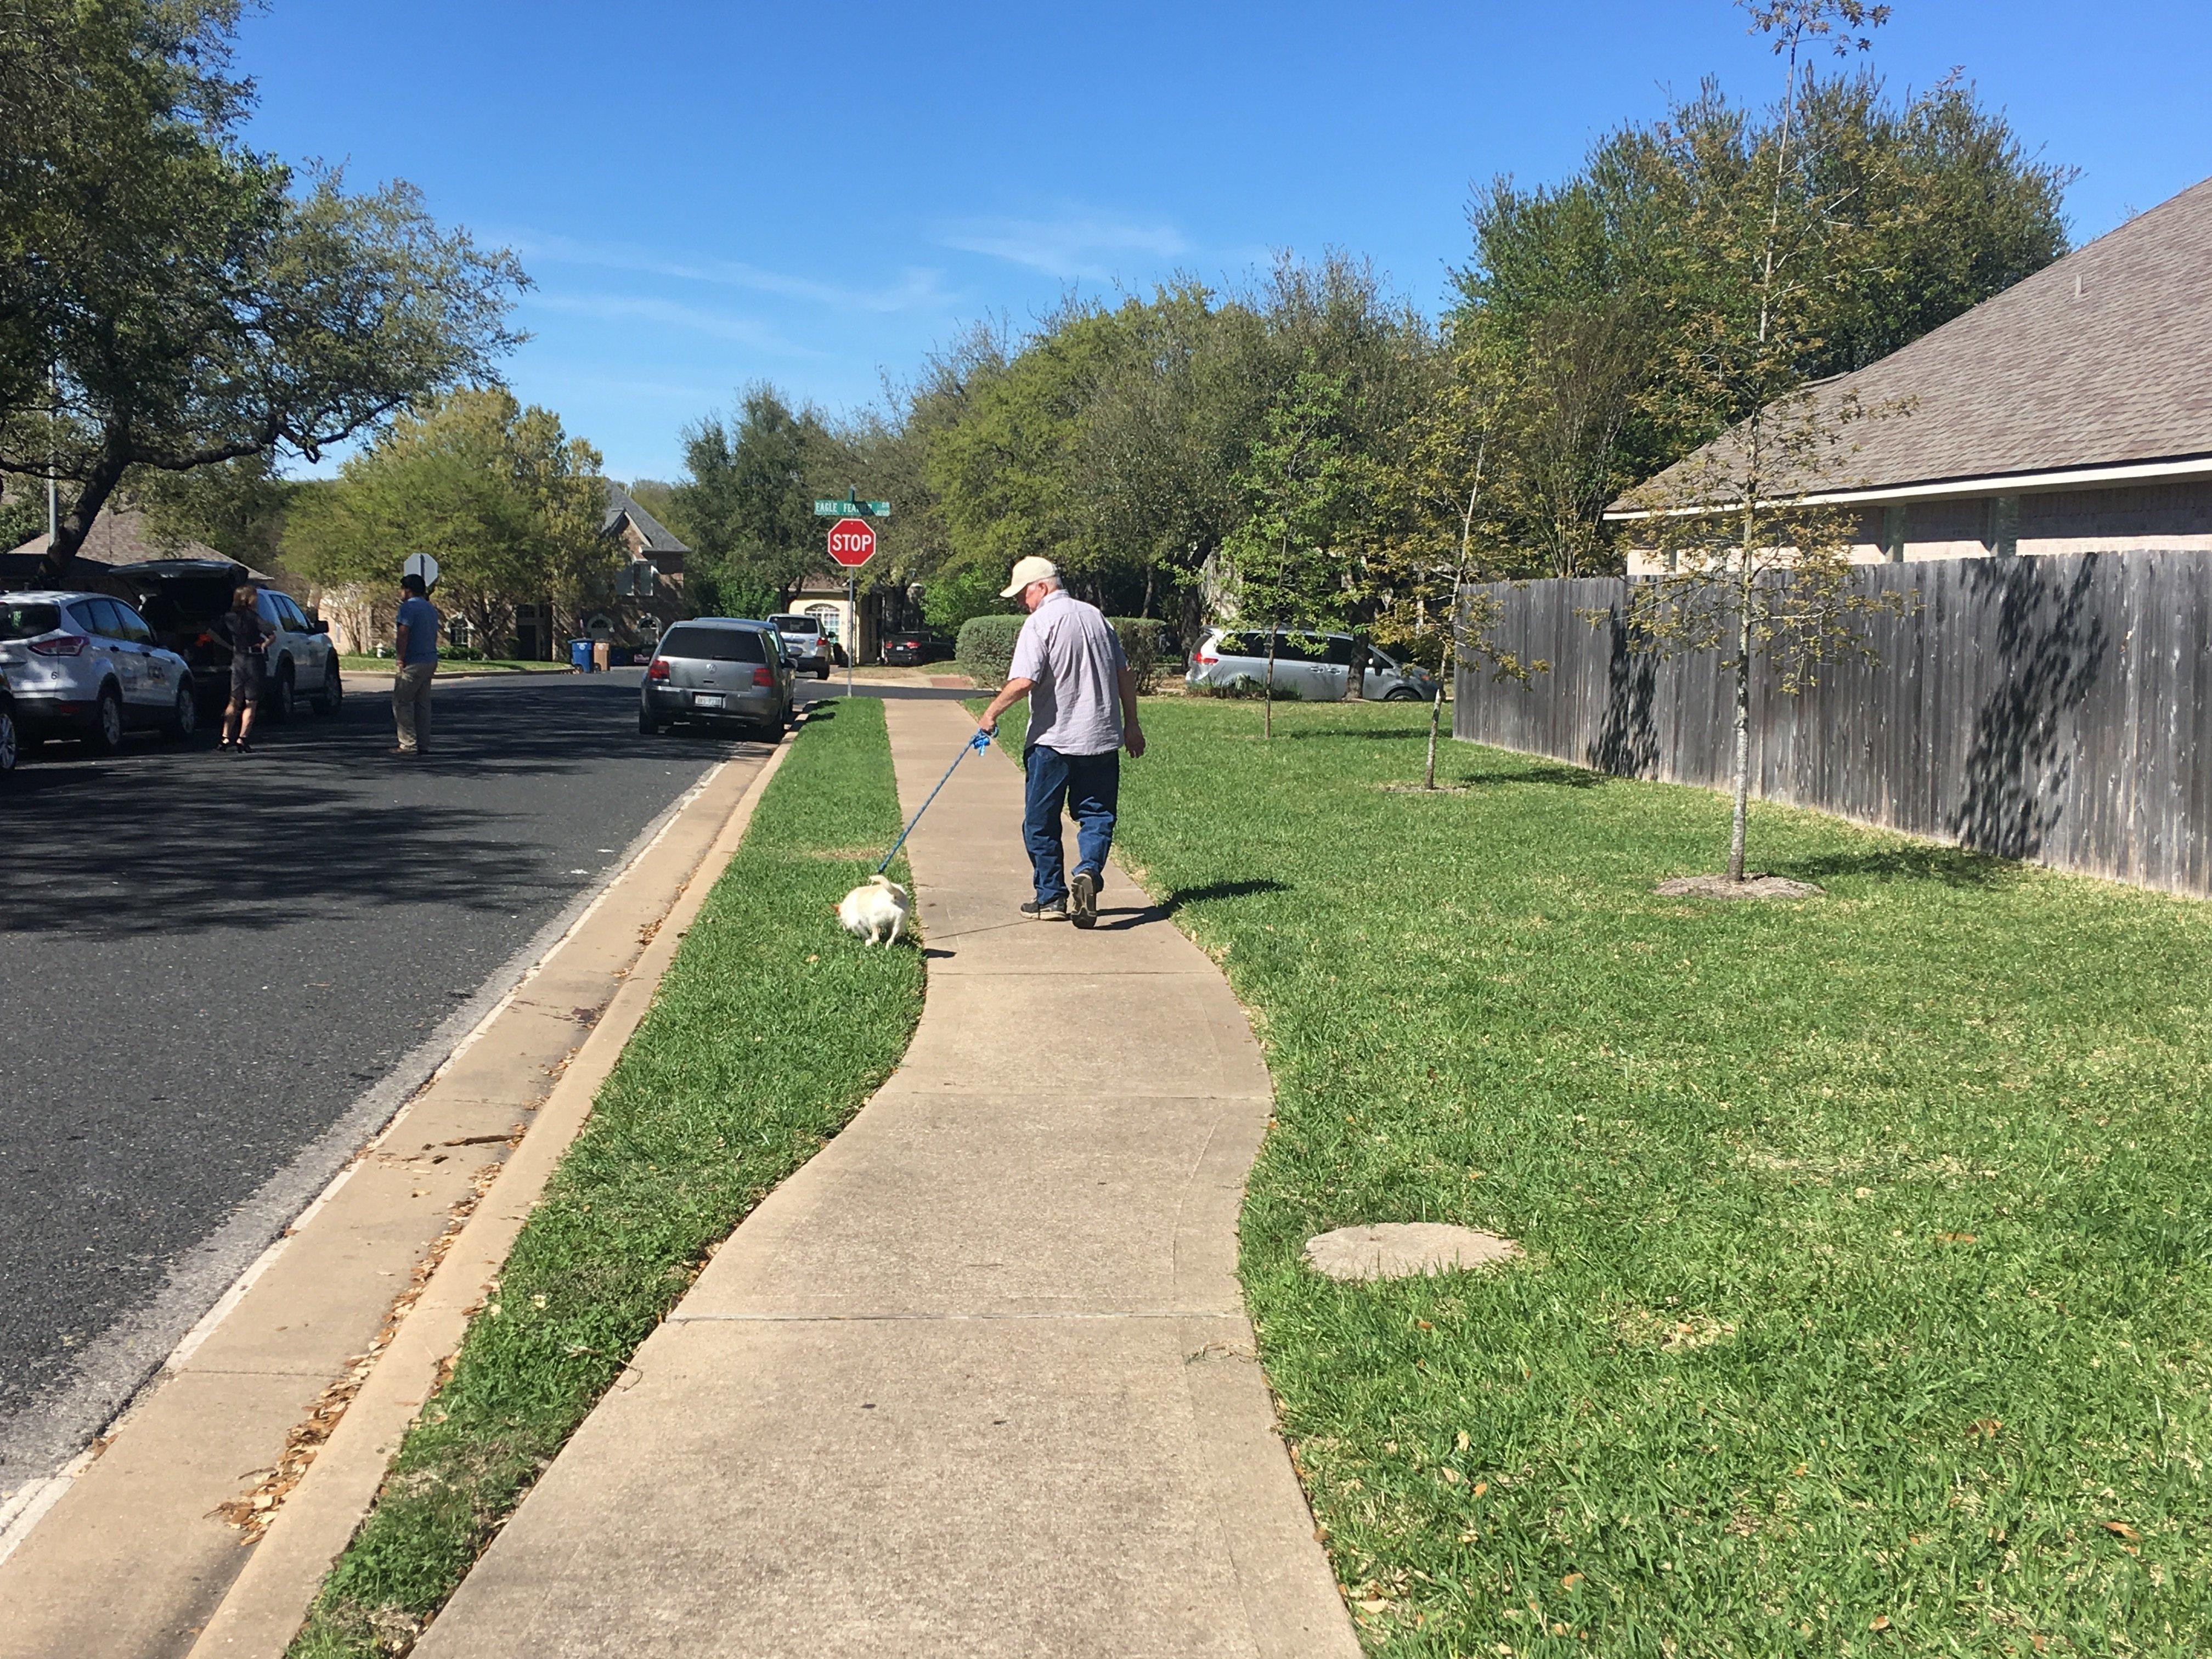 James Barnes walks his dog toward the spot where, days earlier, a tripwire bomb detonated in his sleepy...